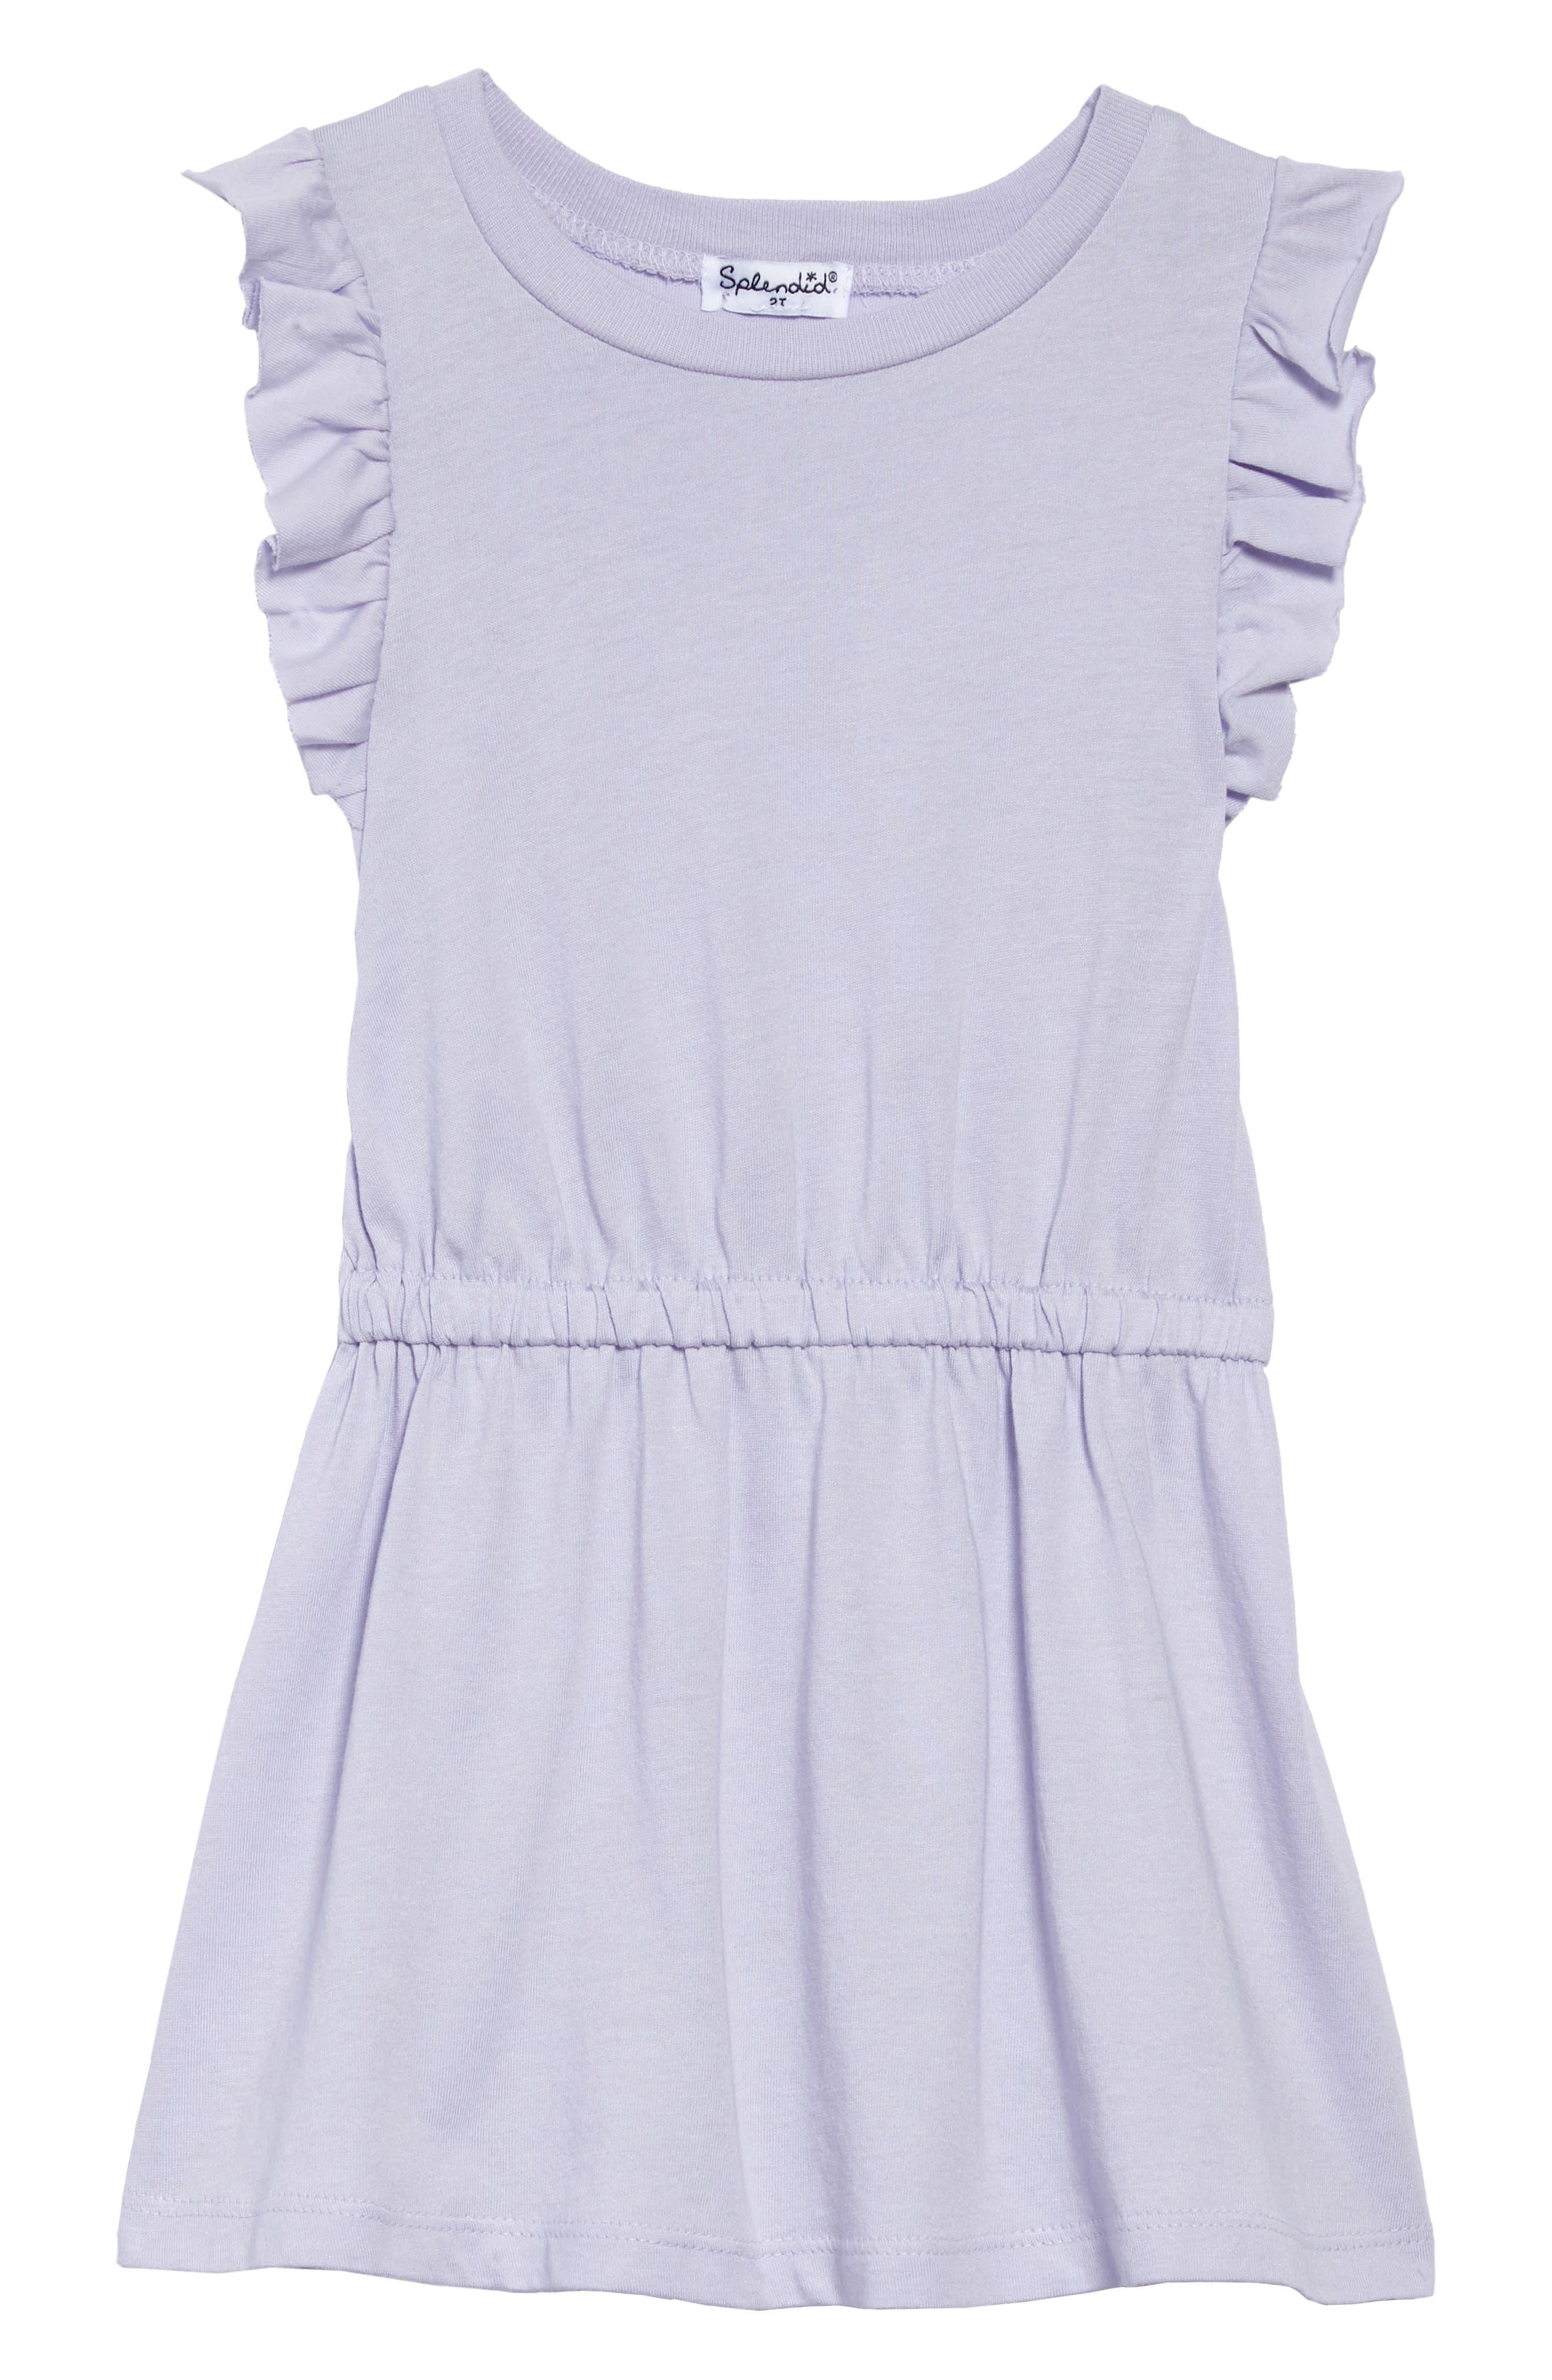 Ruffle Dress,                         Main,                         color, 530